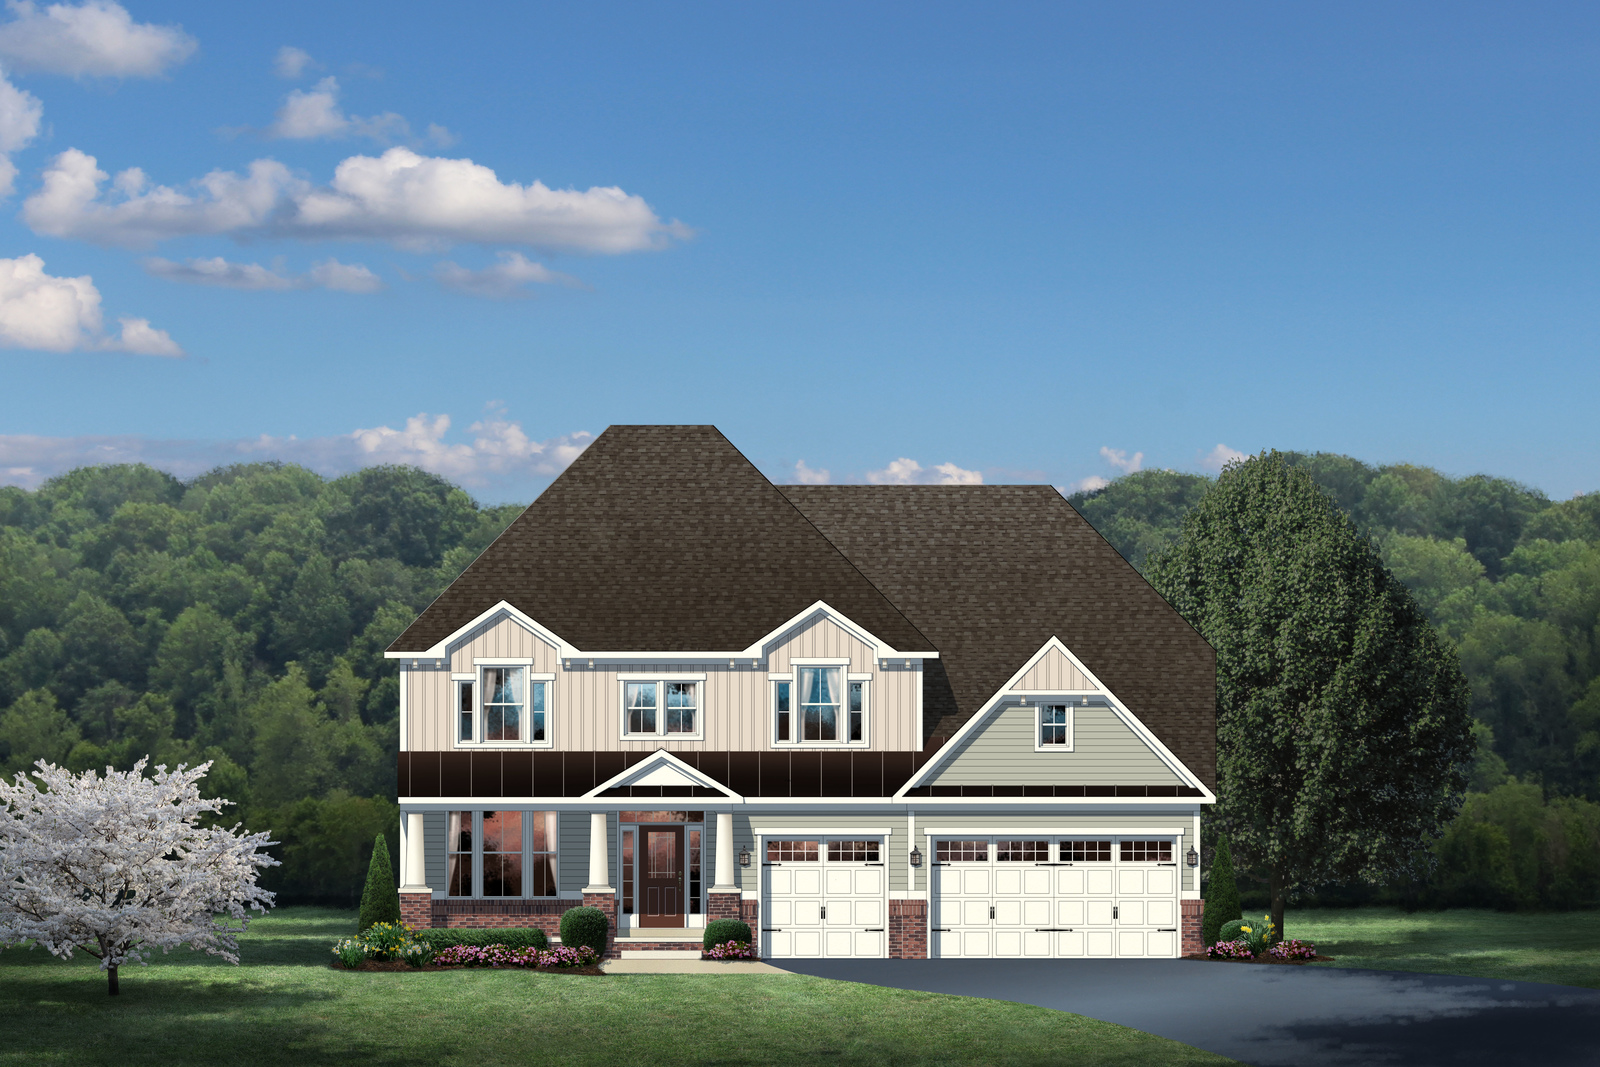 New olsen home model for sale heartland homes for Heartland homes pittsburgh floor plans